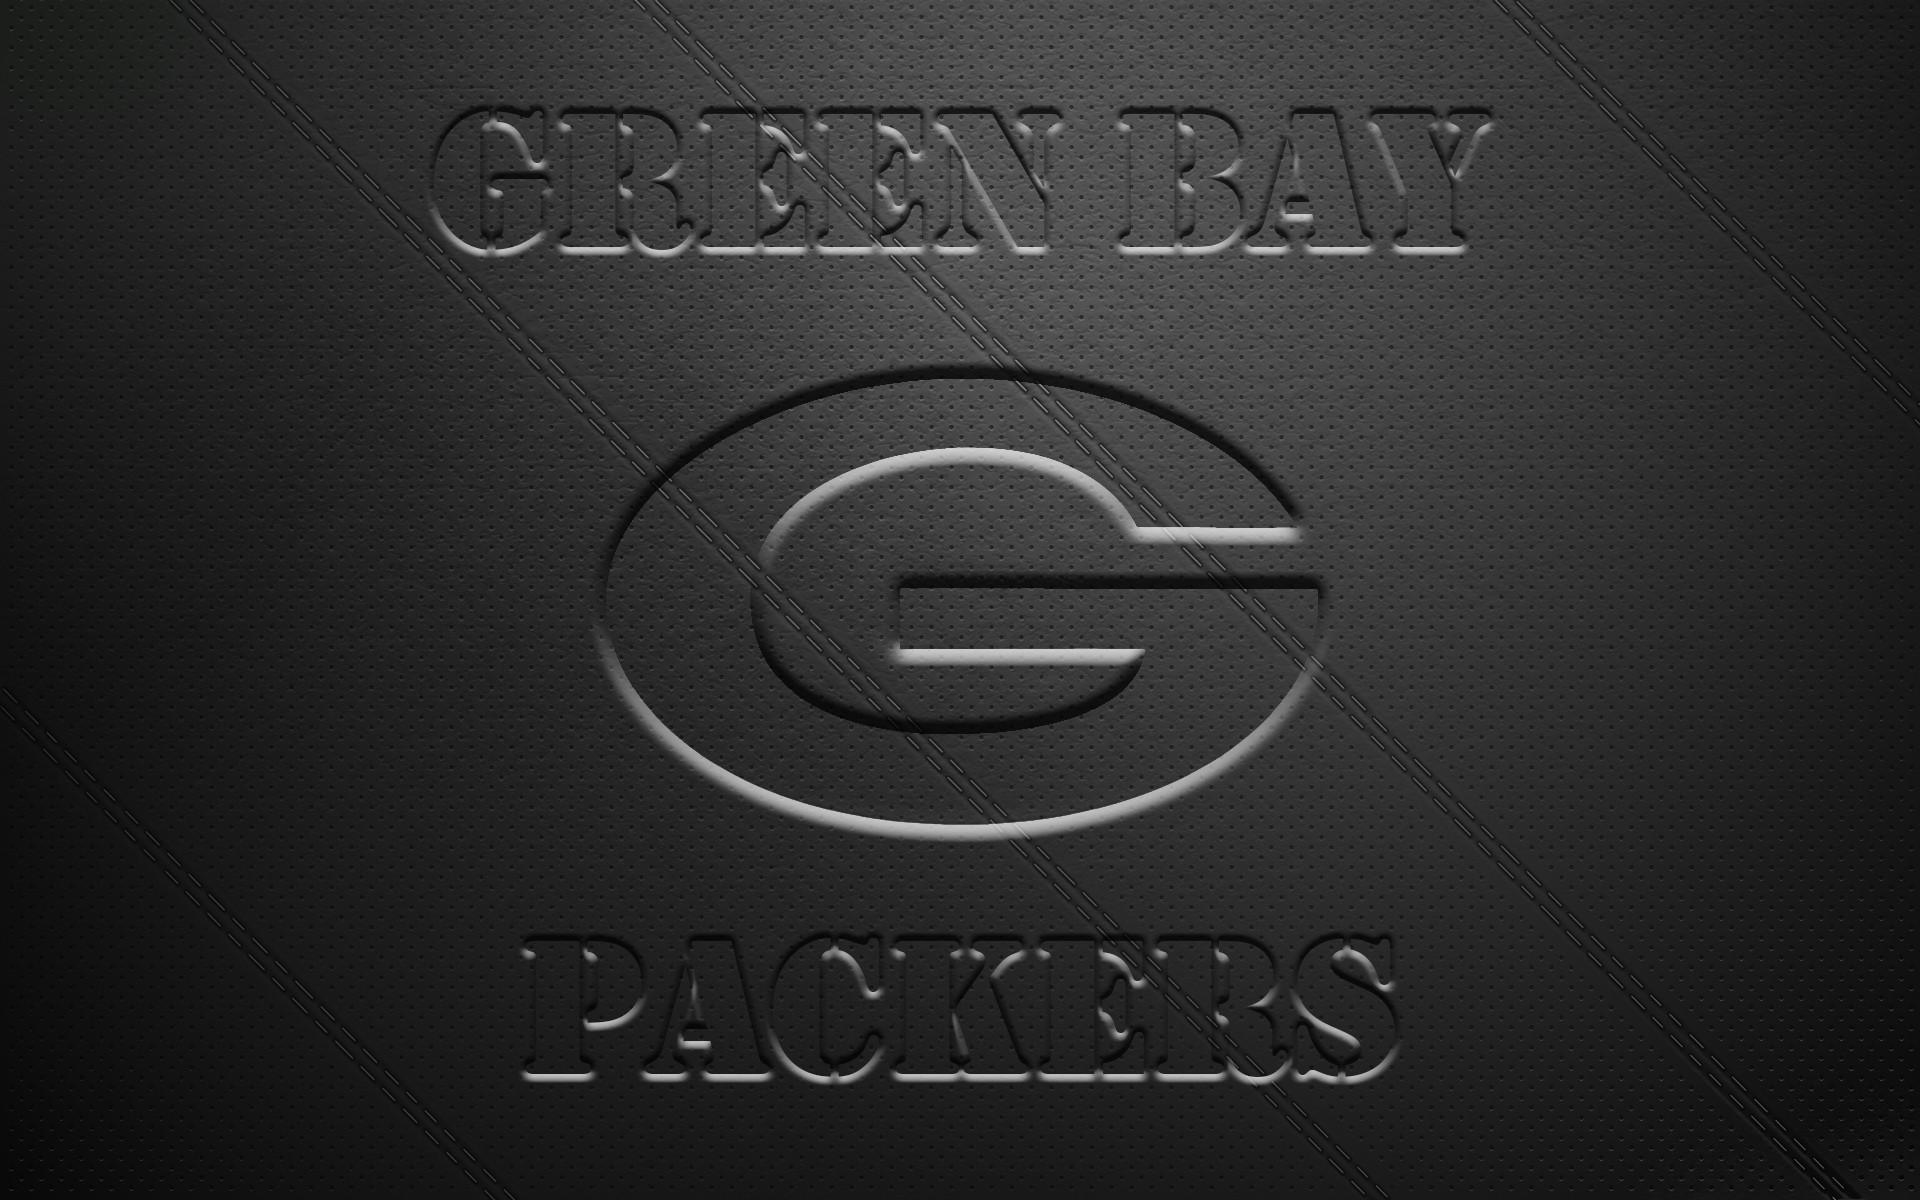 Green-Bay-Packers-Wallpaper-by-Bryan-C-Pier